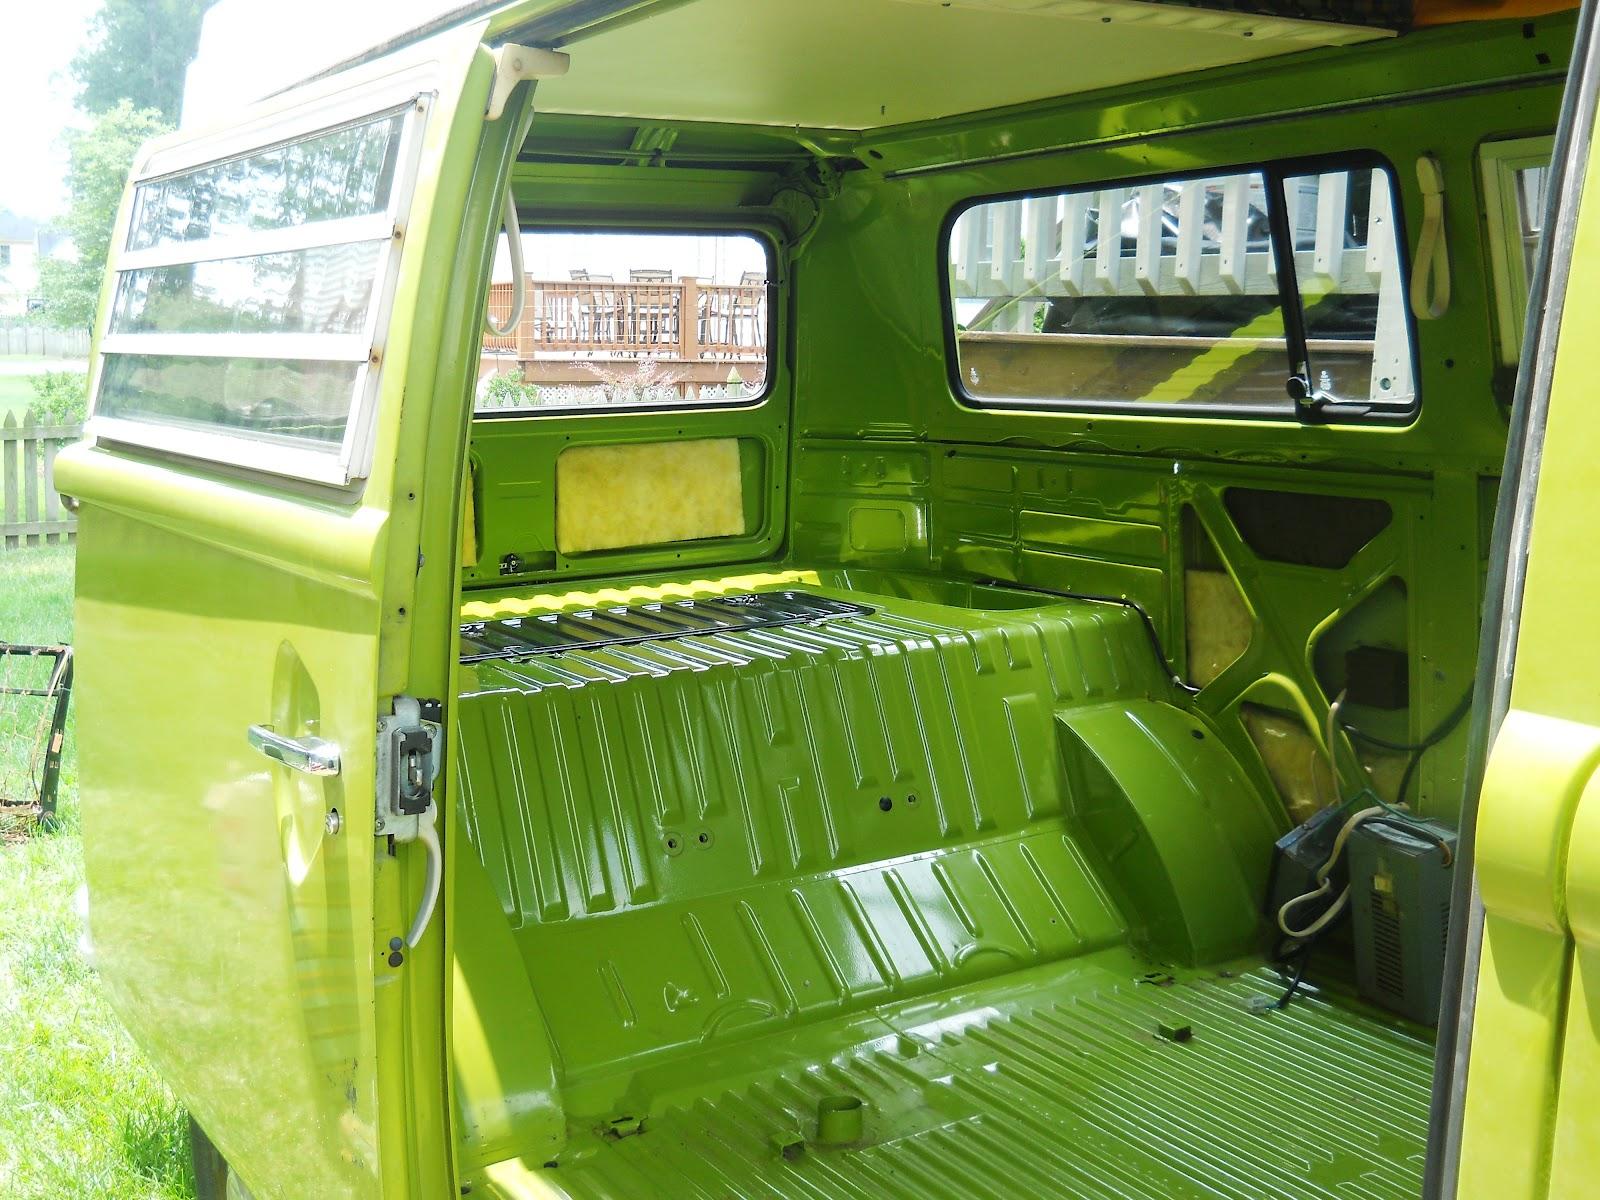 76 Vw Bus Restoration Removing The Interior